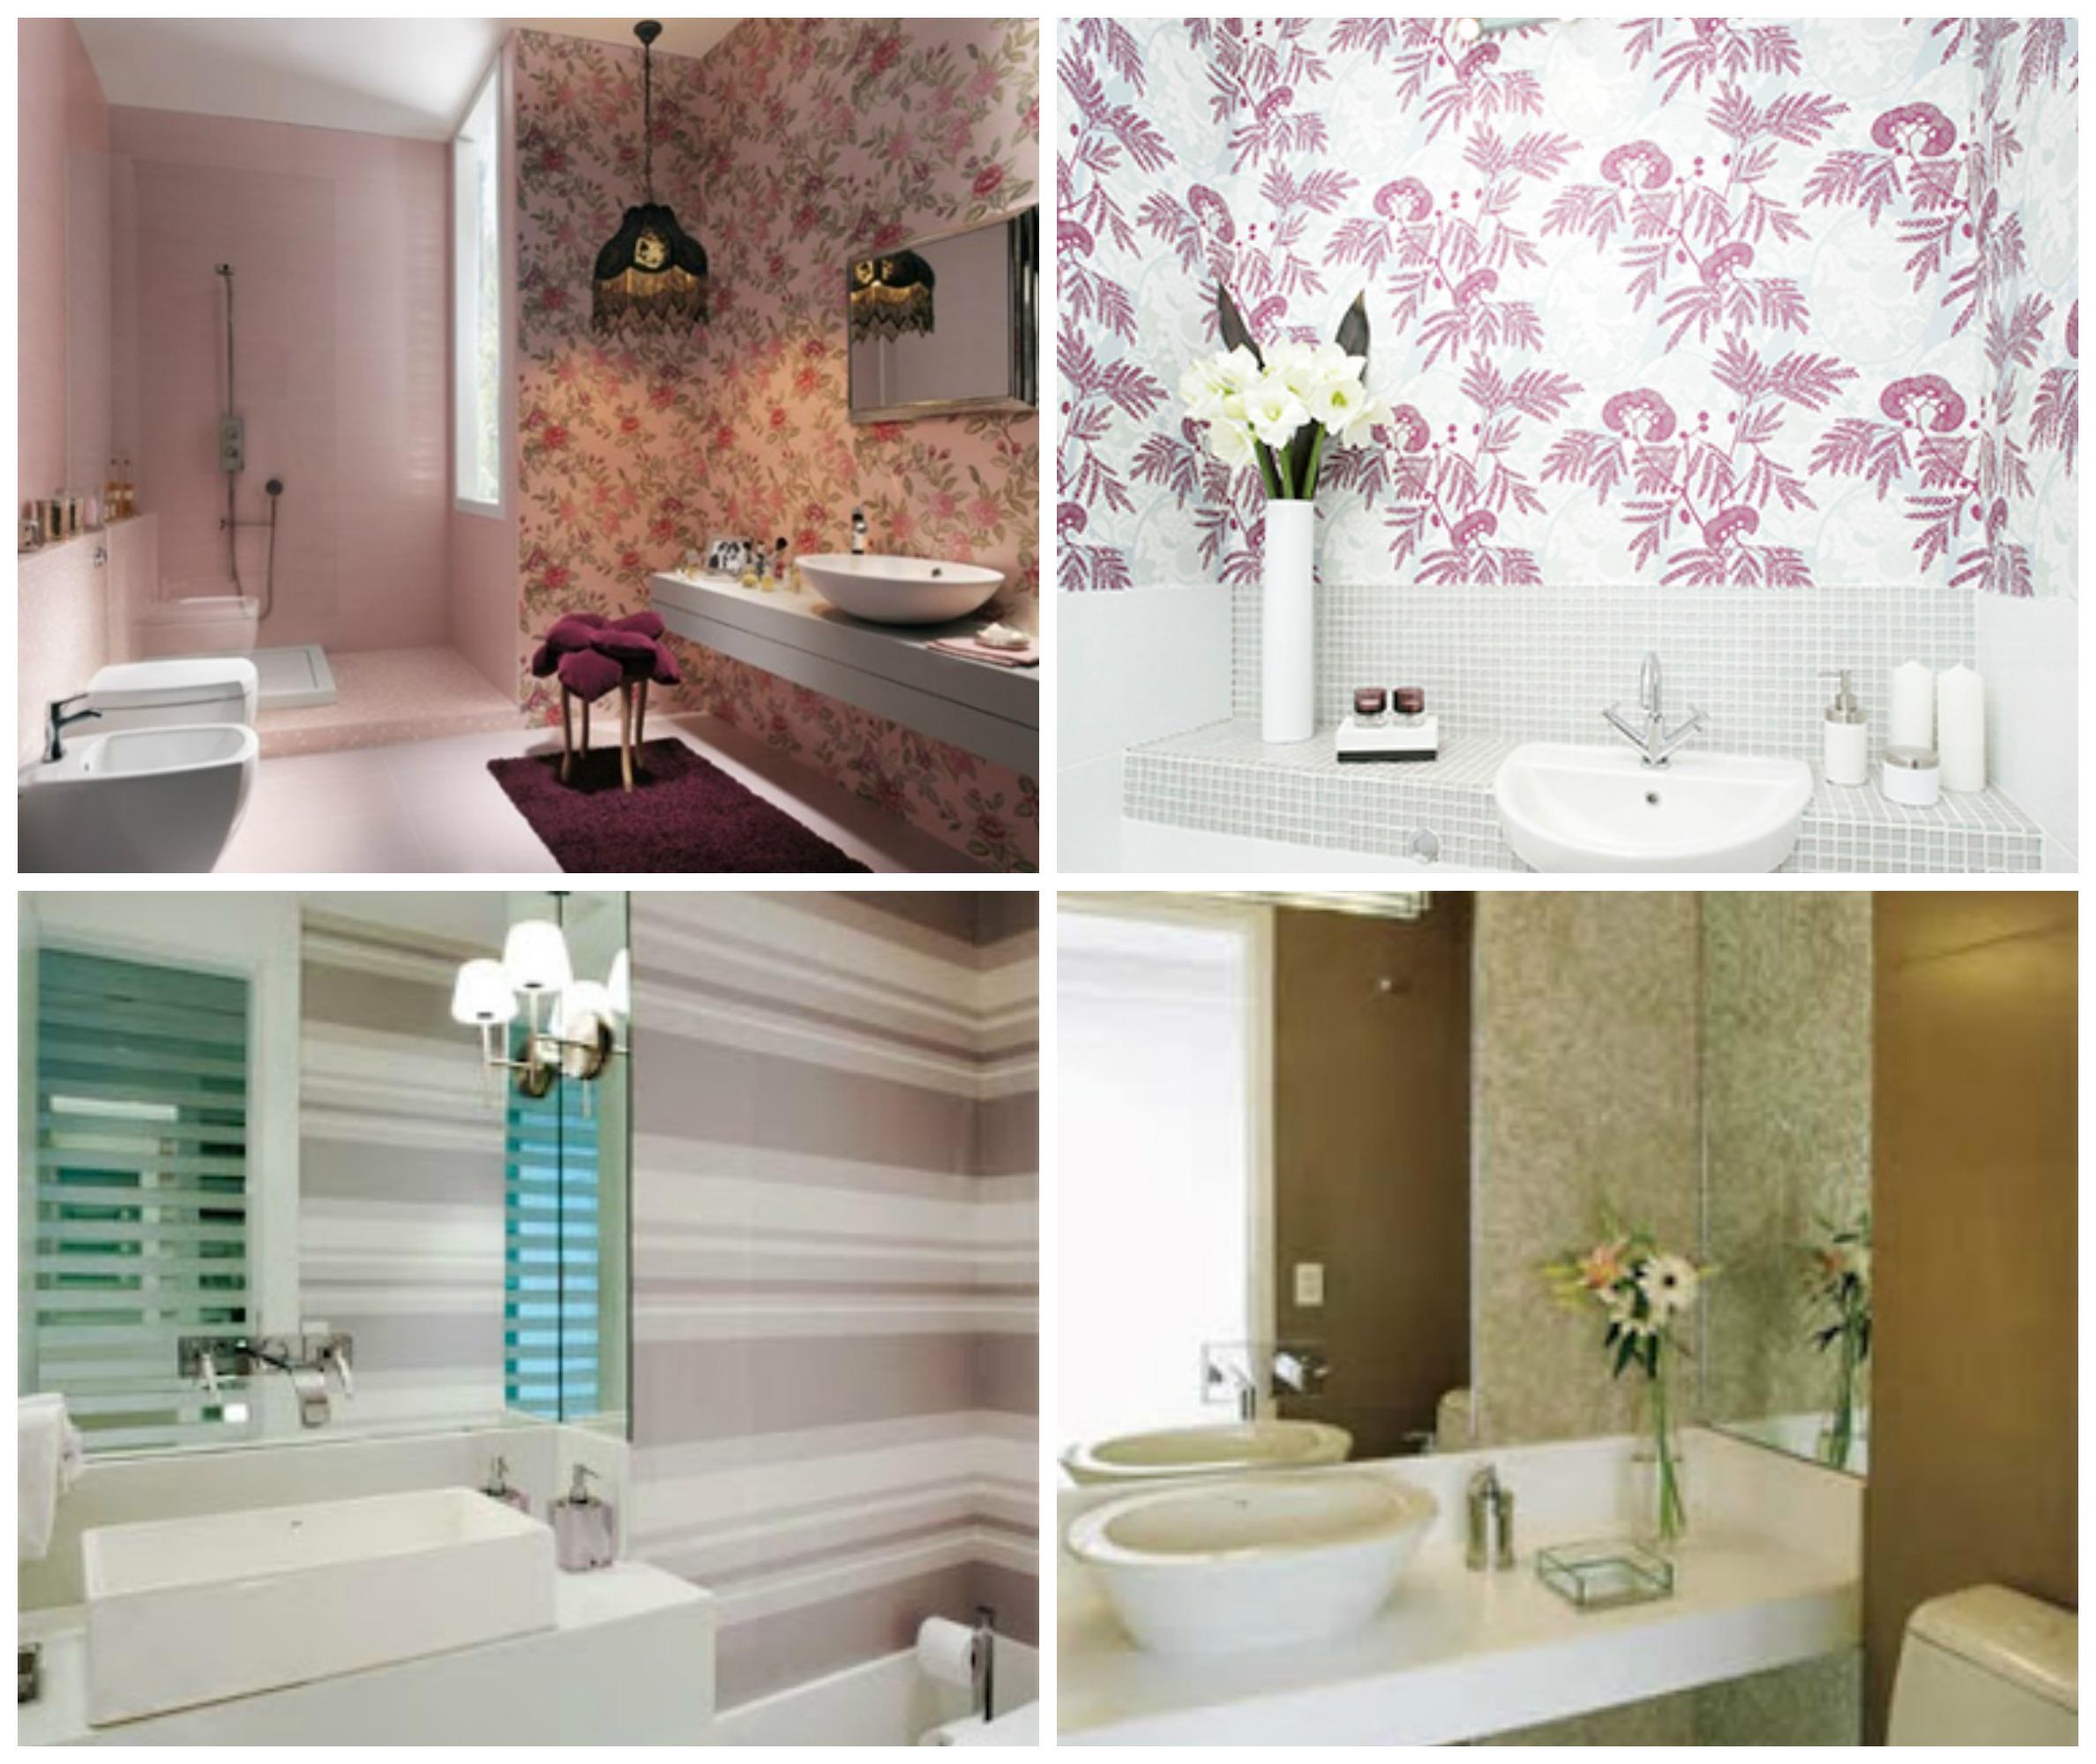 banheiroo #7A643E 2376 2000